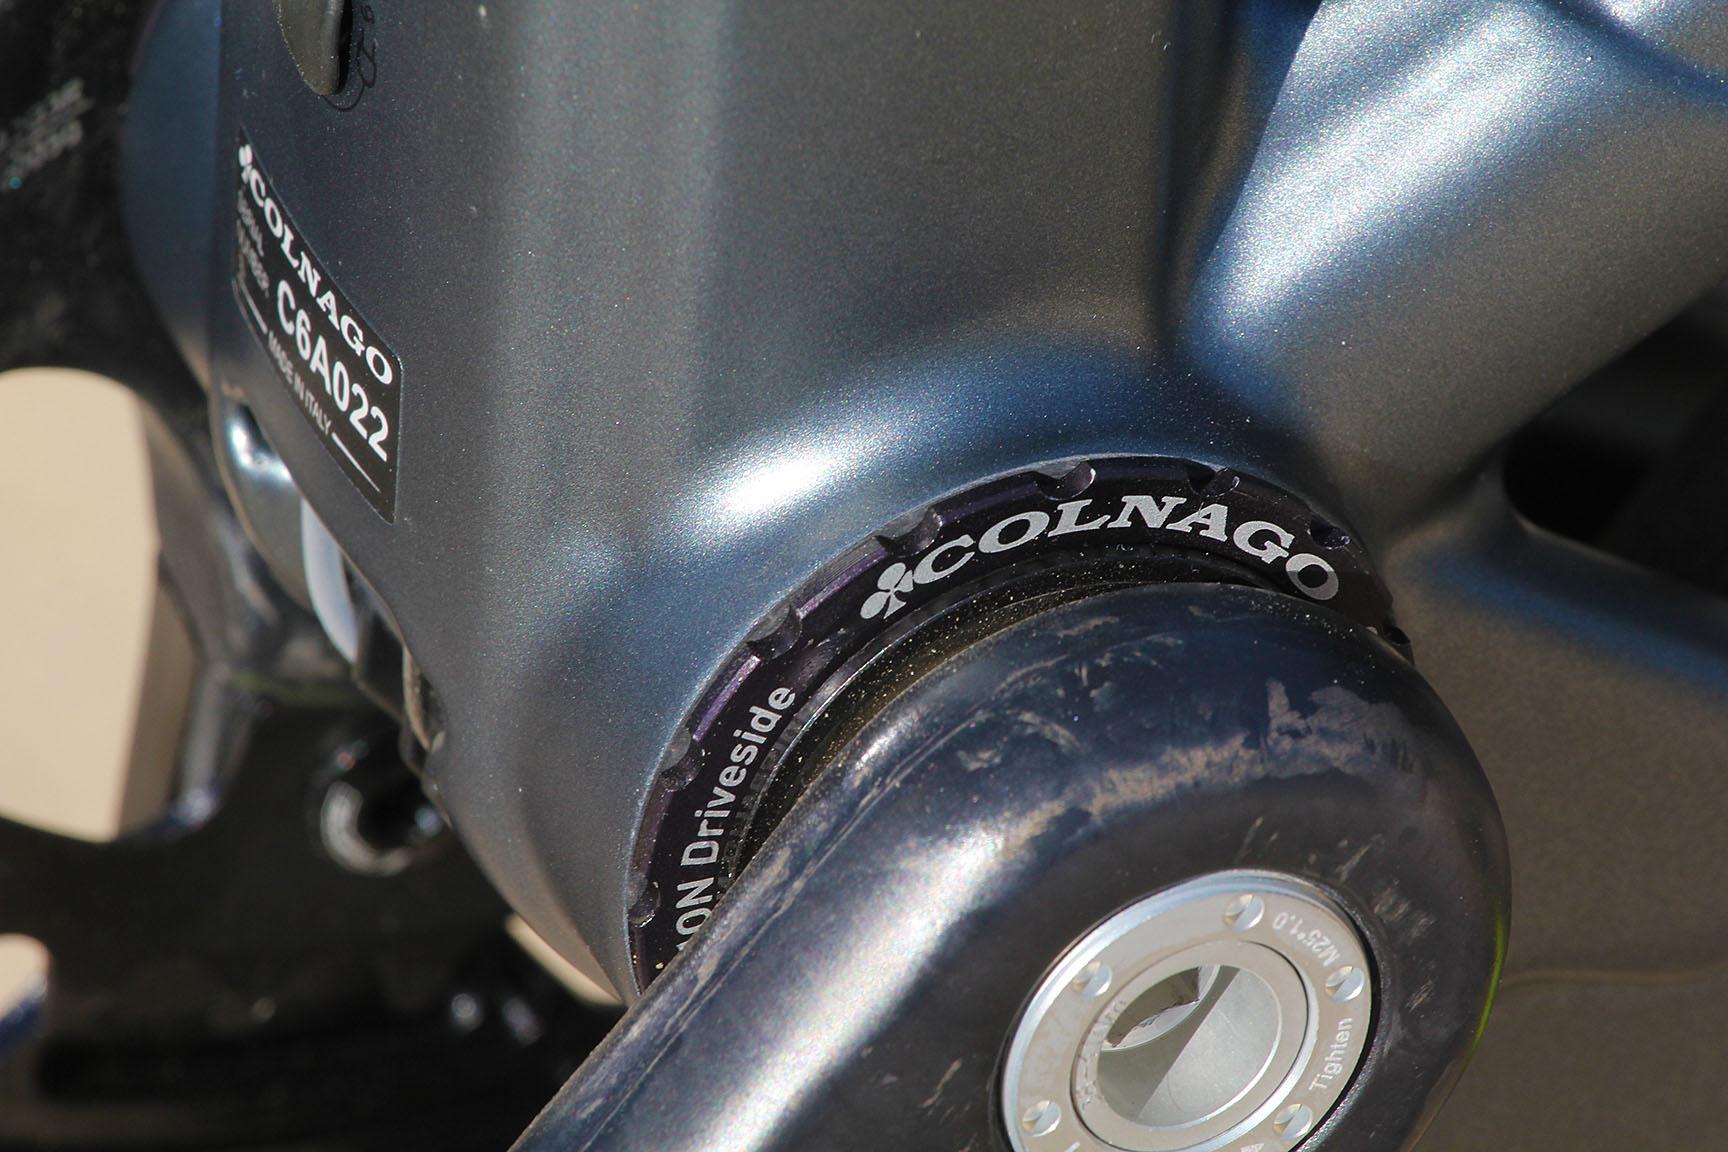 9 Colnago C60 Road Bike Frame 349995 Sensational Performance Trailer Country C2 Bb Wiring Diagram Threaded Insert